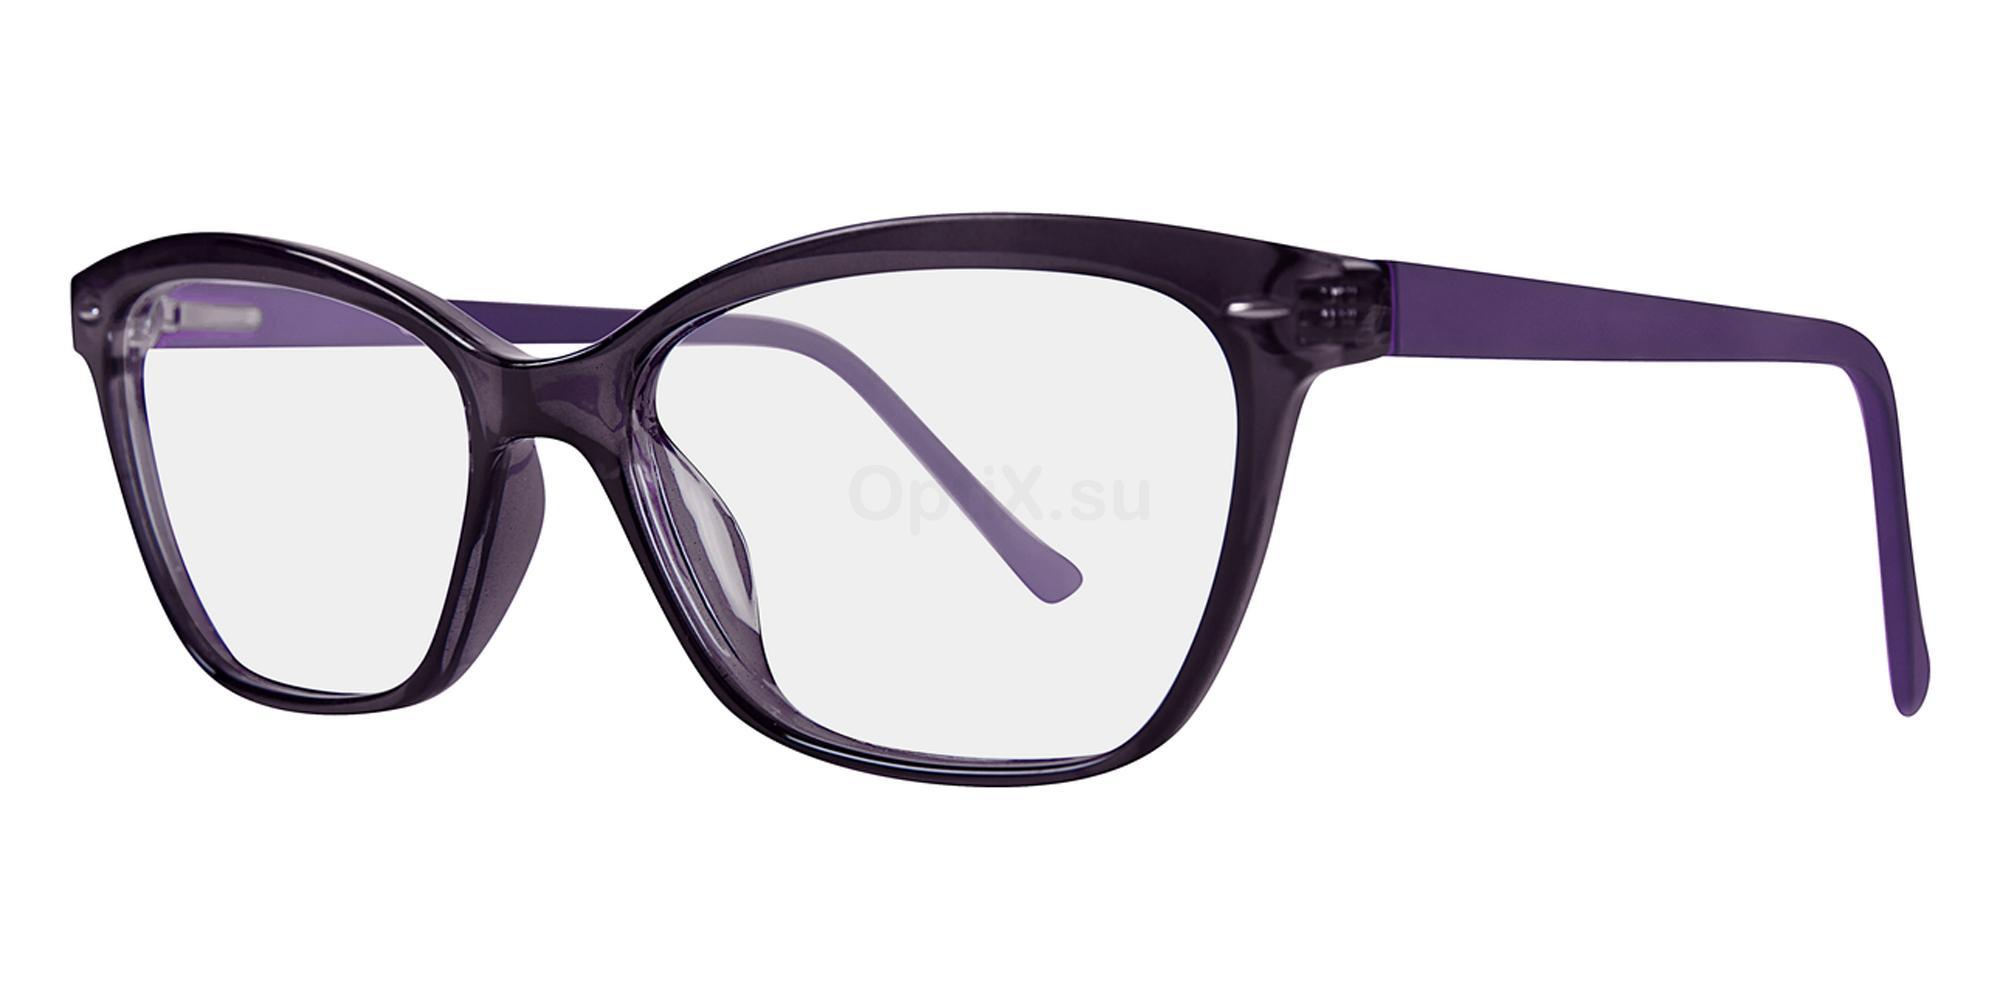 C1 Complete 2 Mod 12 Glasses, Complete